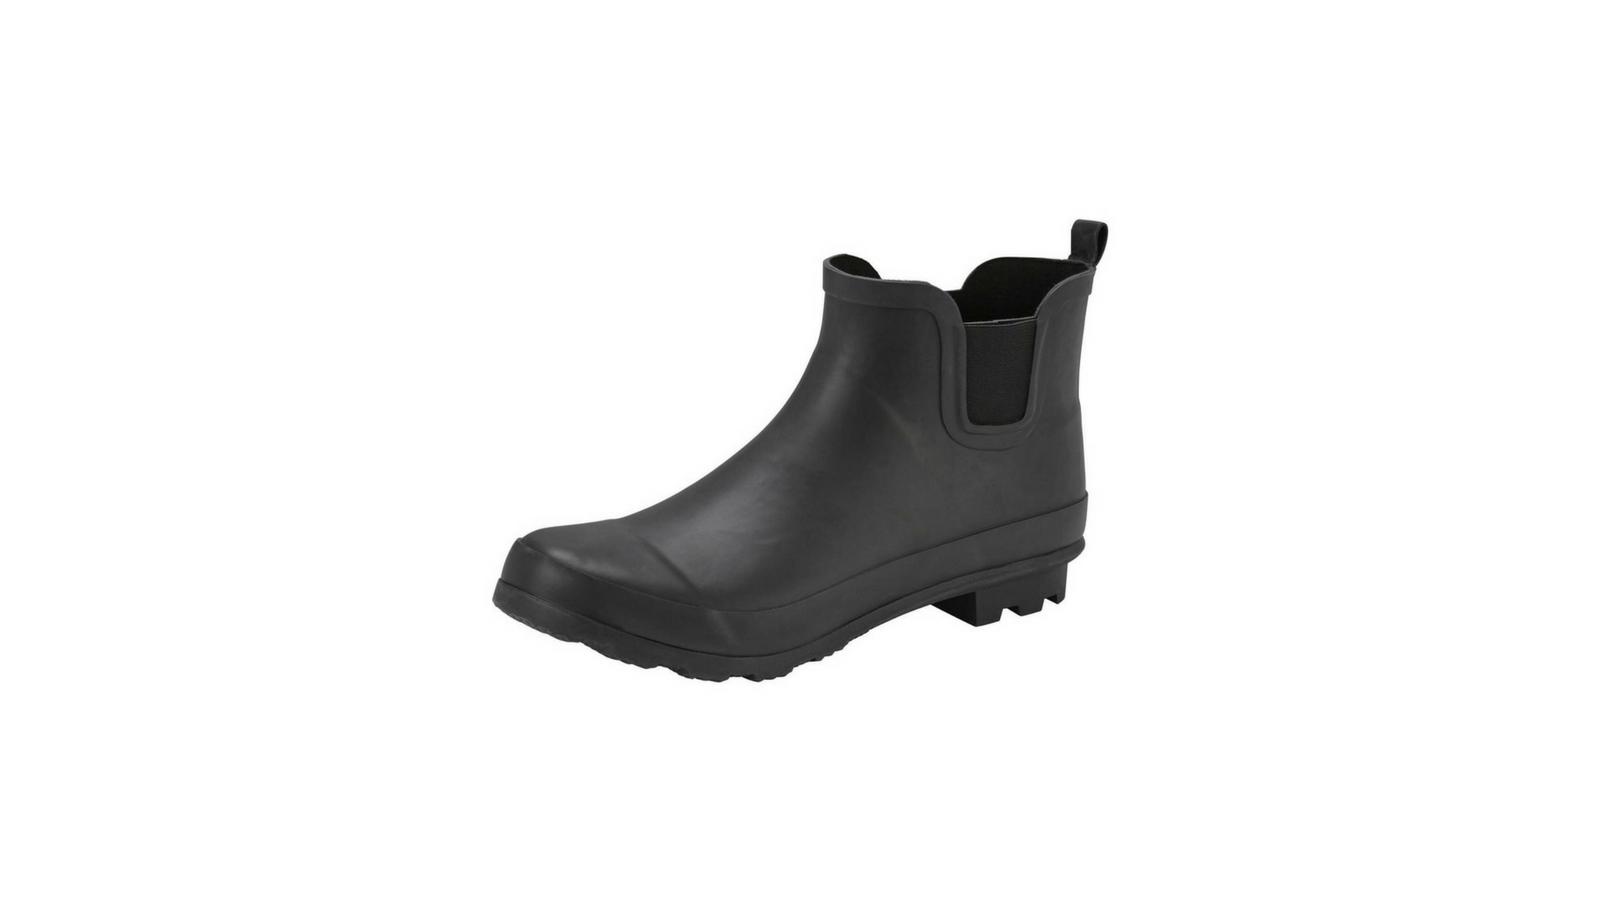 Best Wellington Boots For Dog Walking